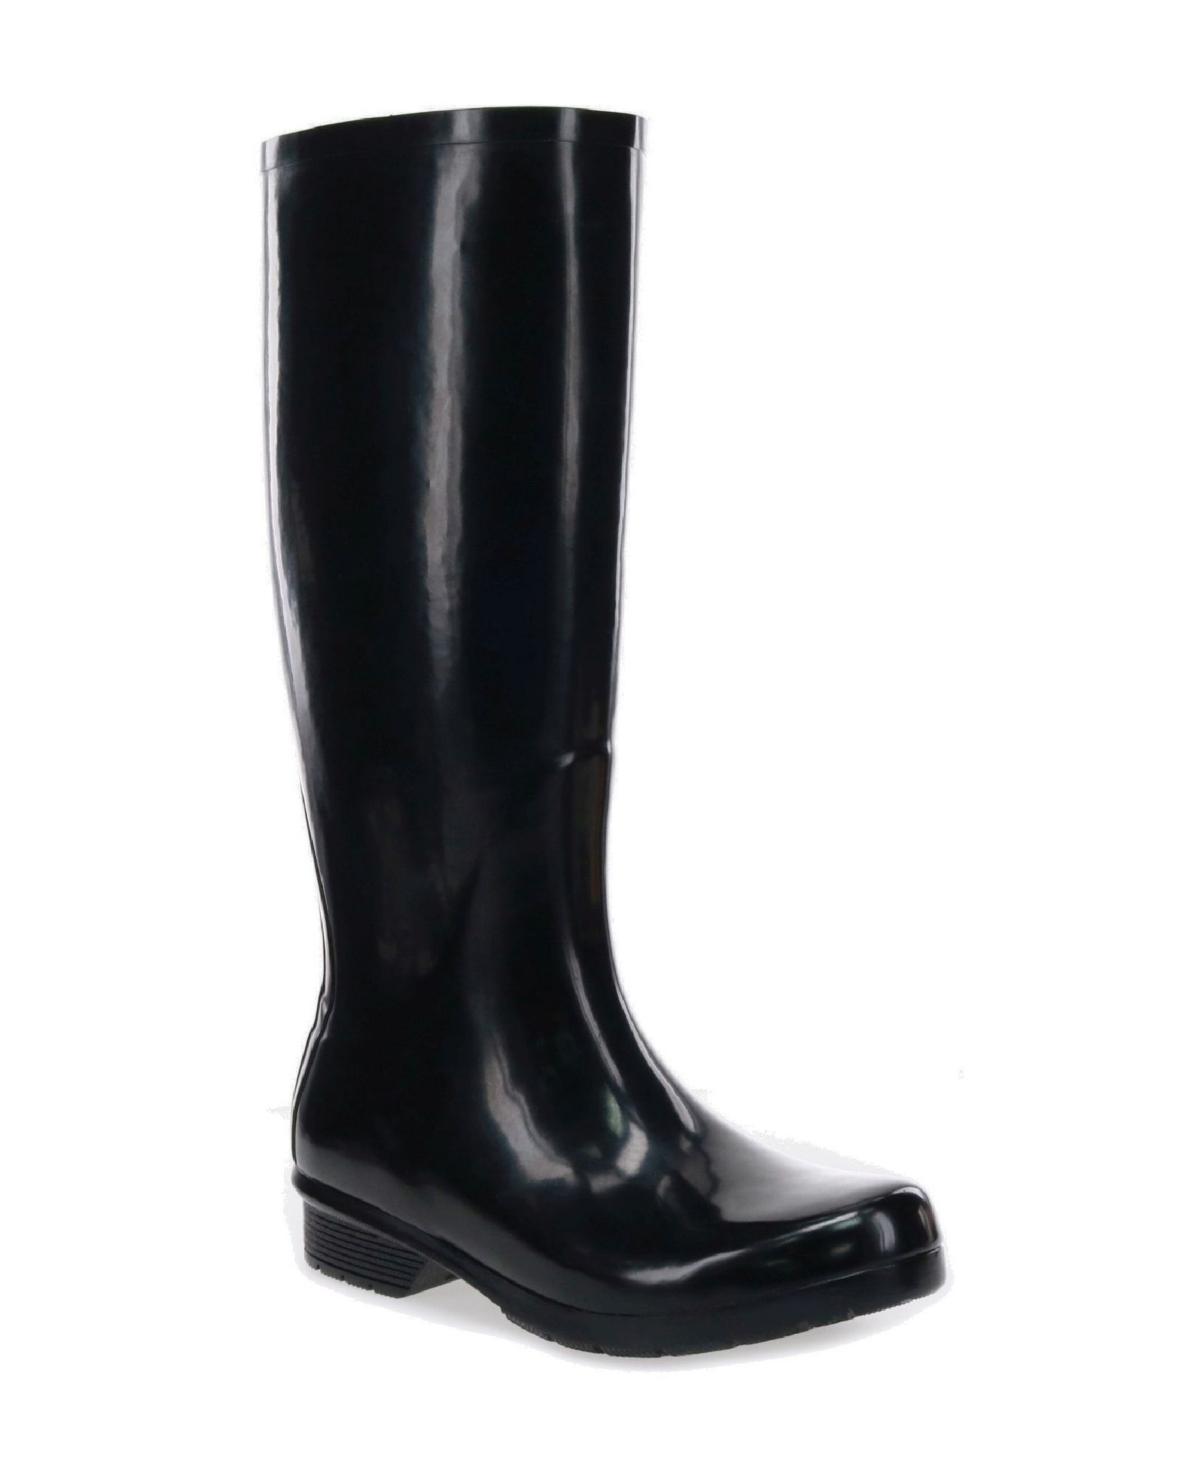 Women's Polished Tall Boot Women's Shoes